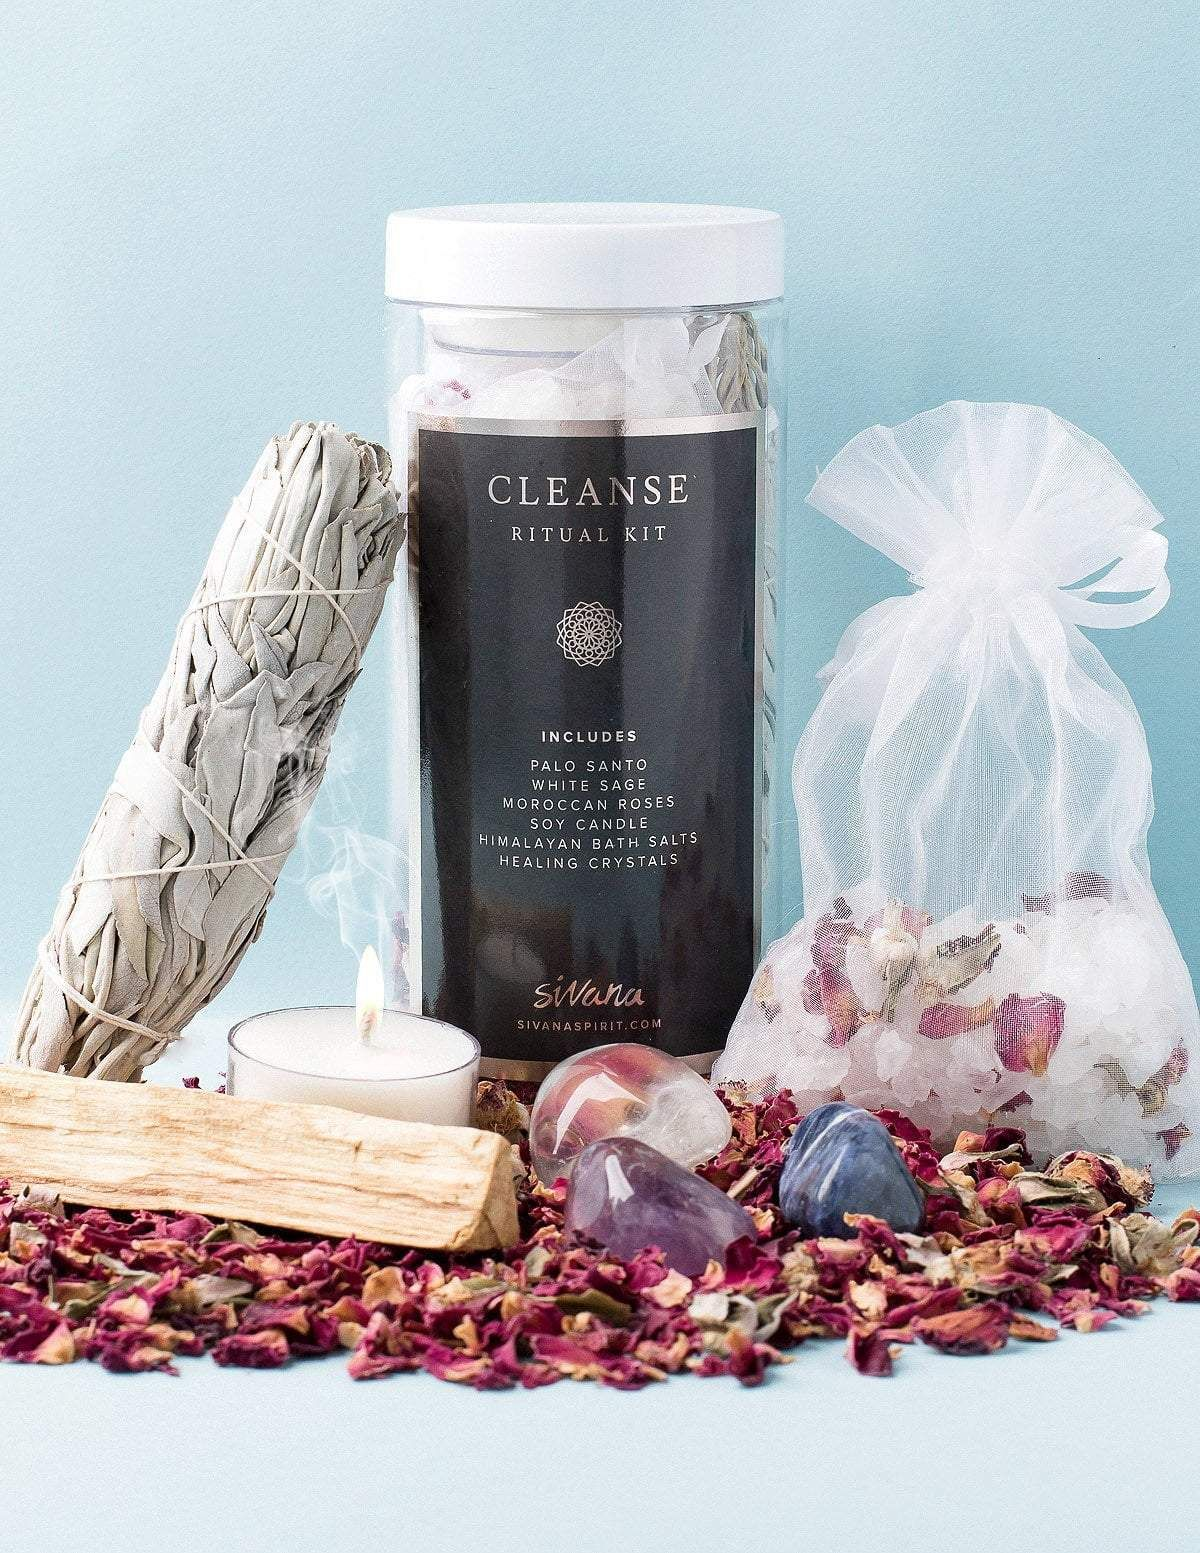 Cleanse ritual kit crystal healing tea candles healing